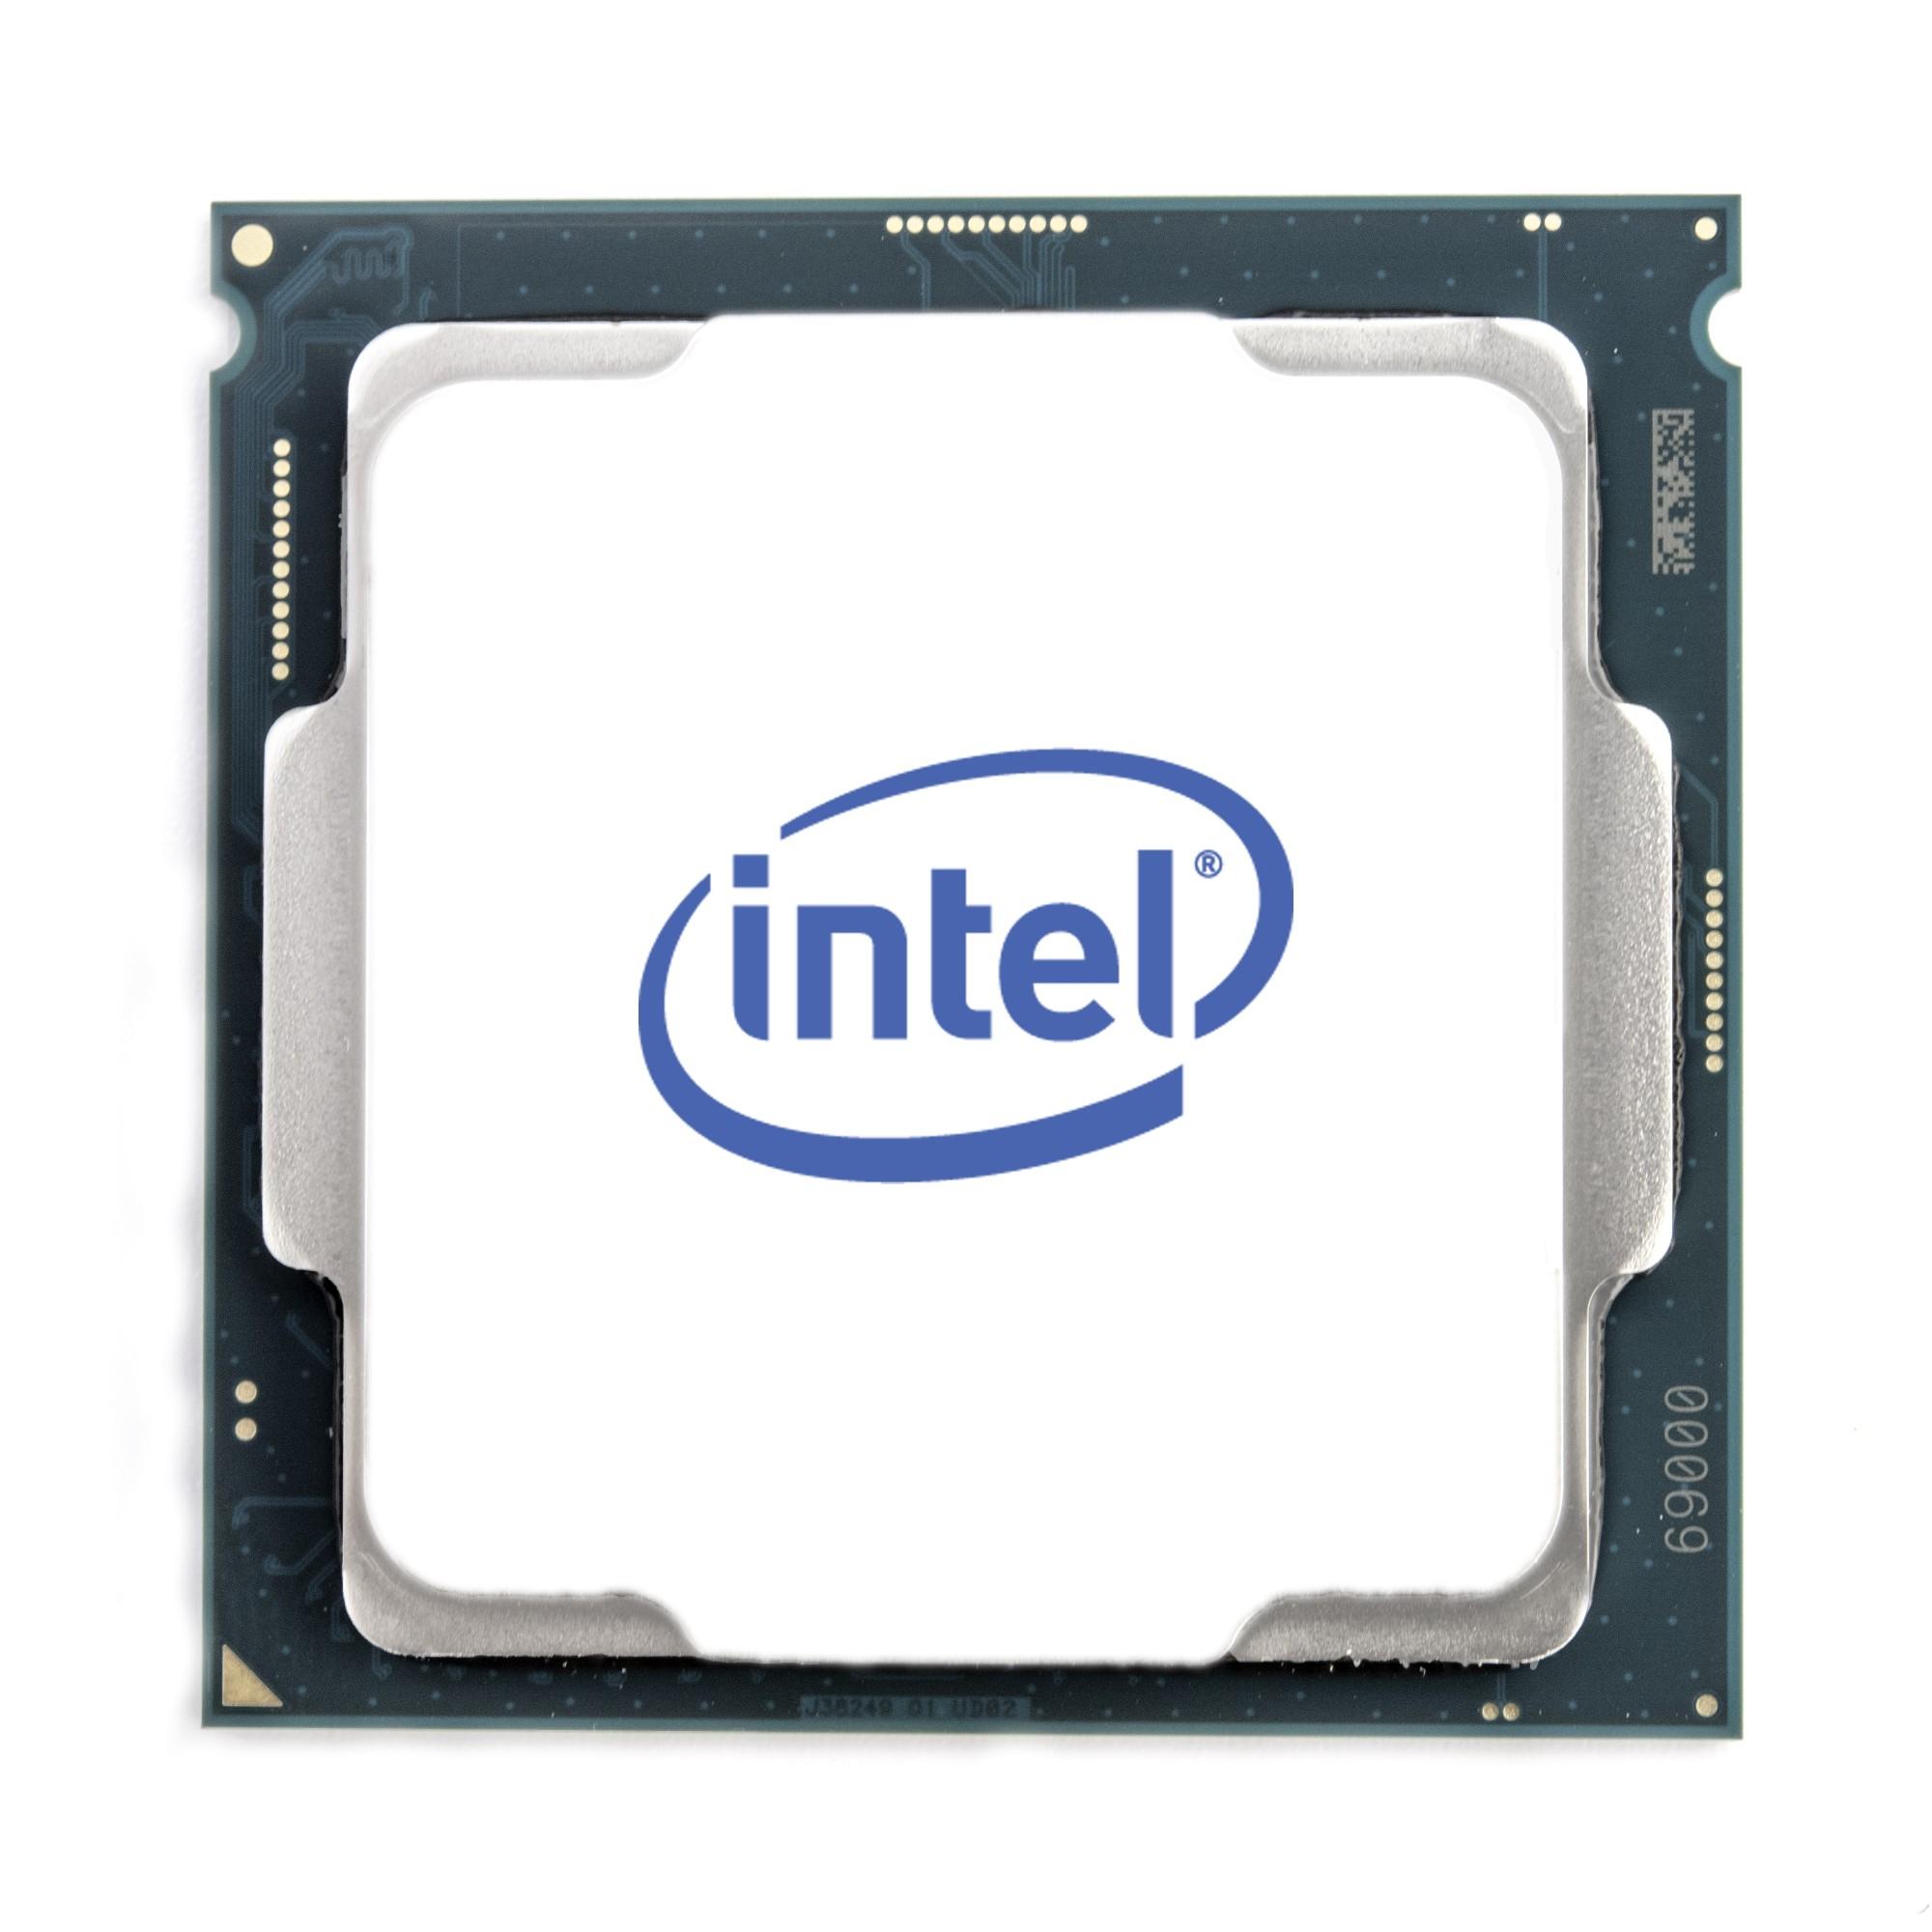 Intel Core i9-9900K processor 3.6 GHz 16 MB Smart Cache